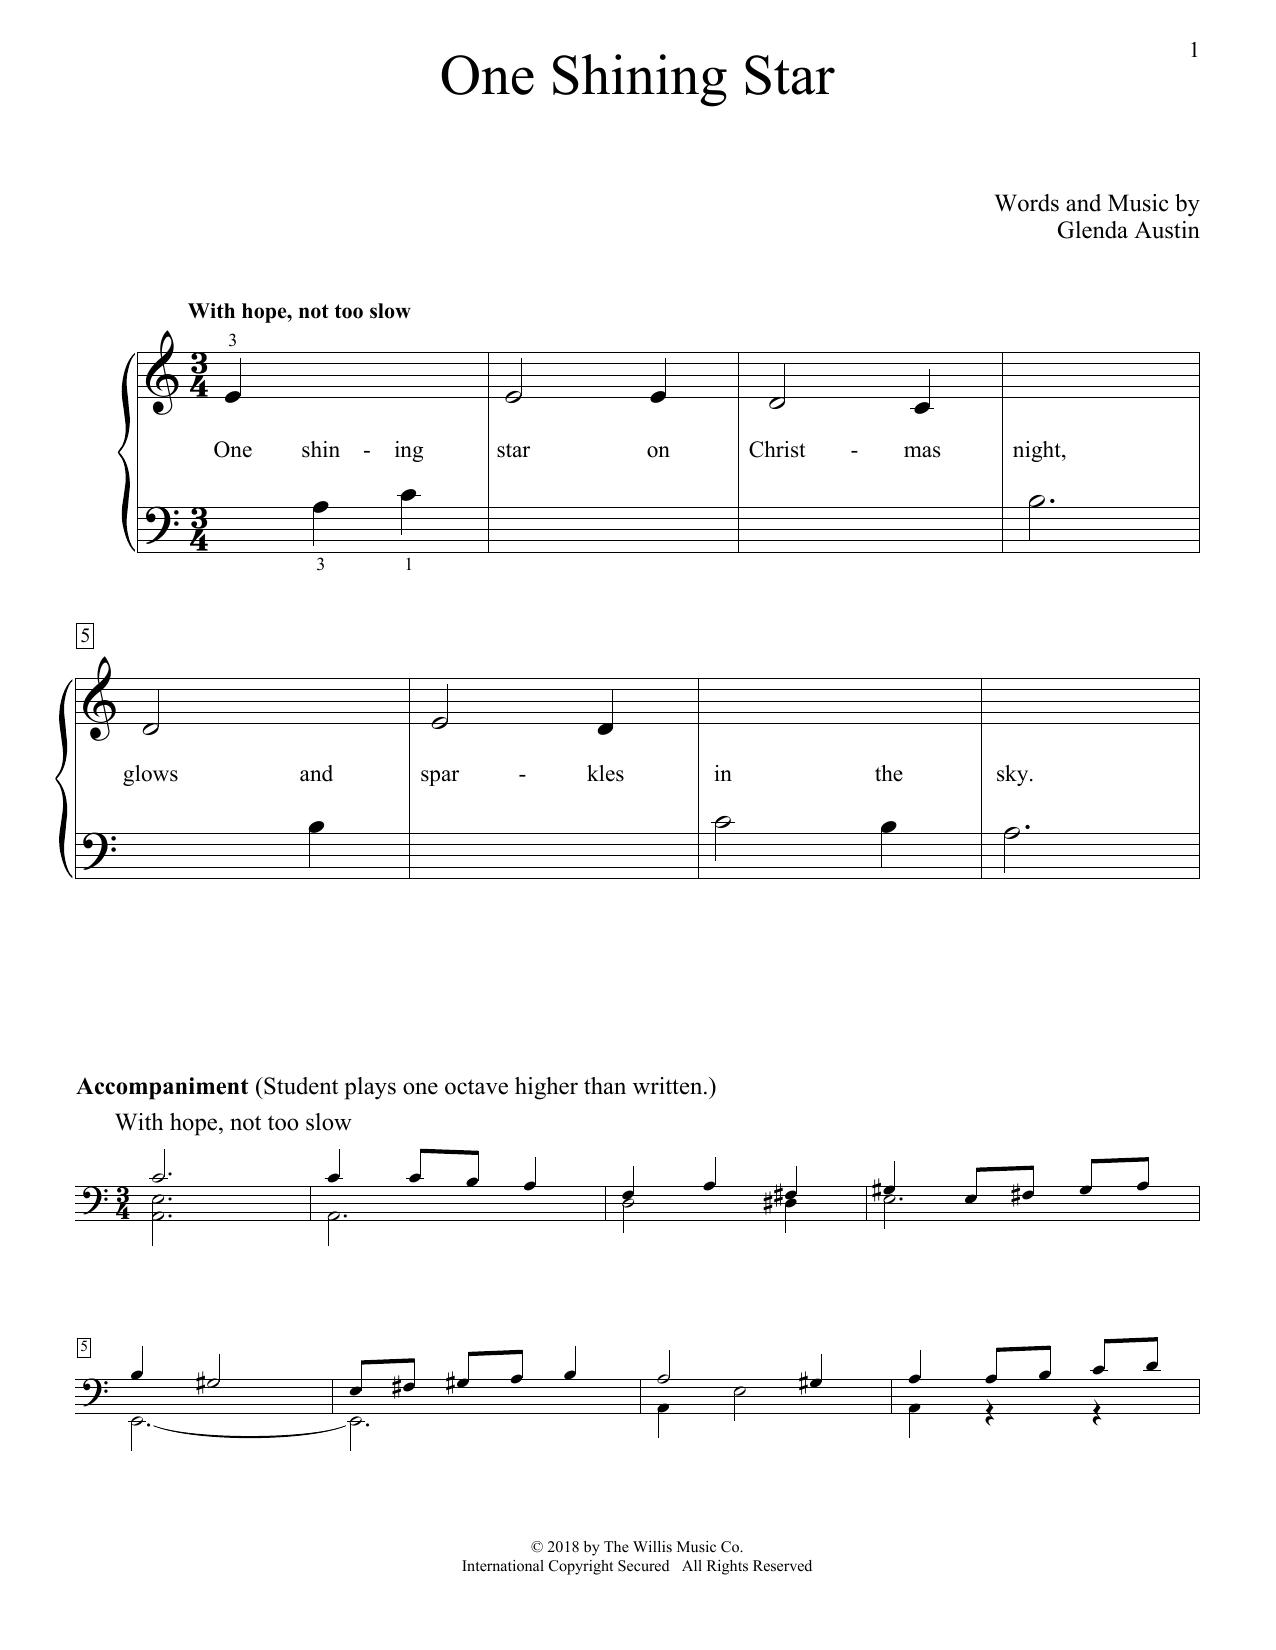 One Shining Star Sheet Music